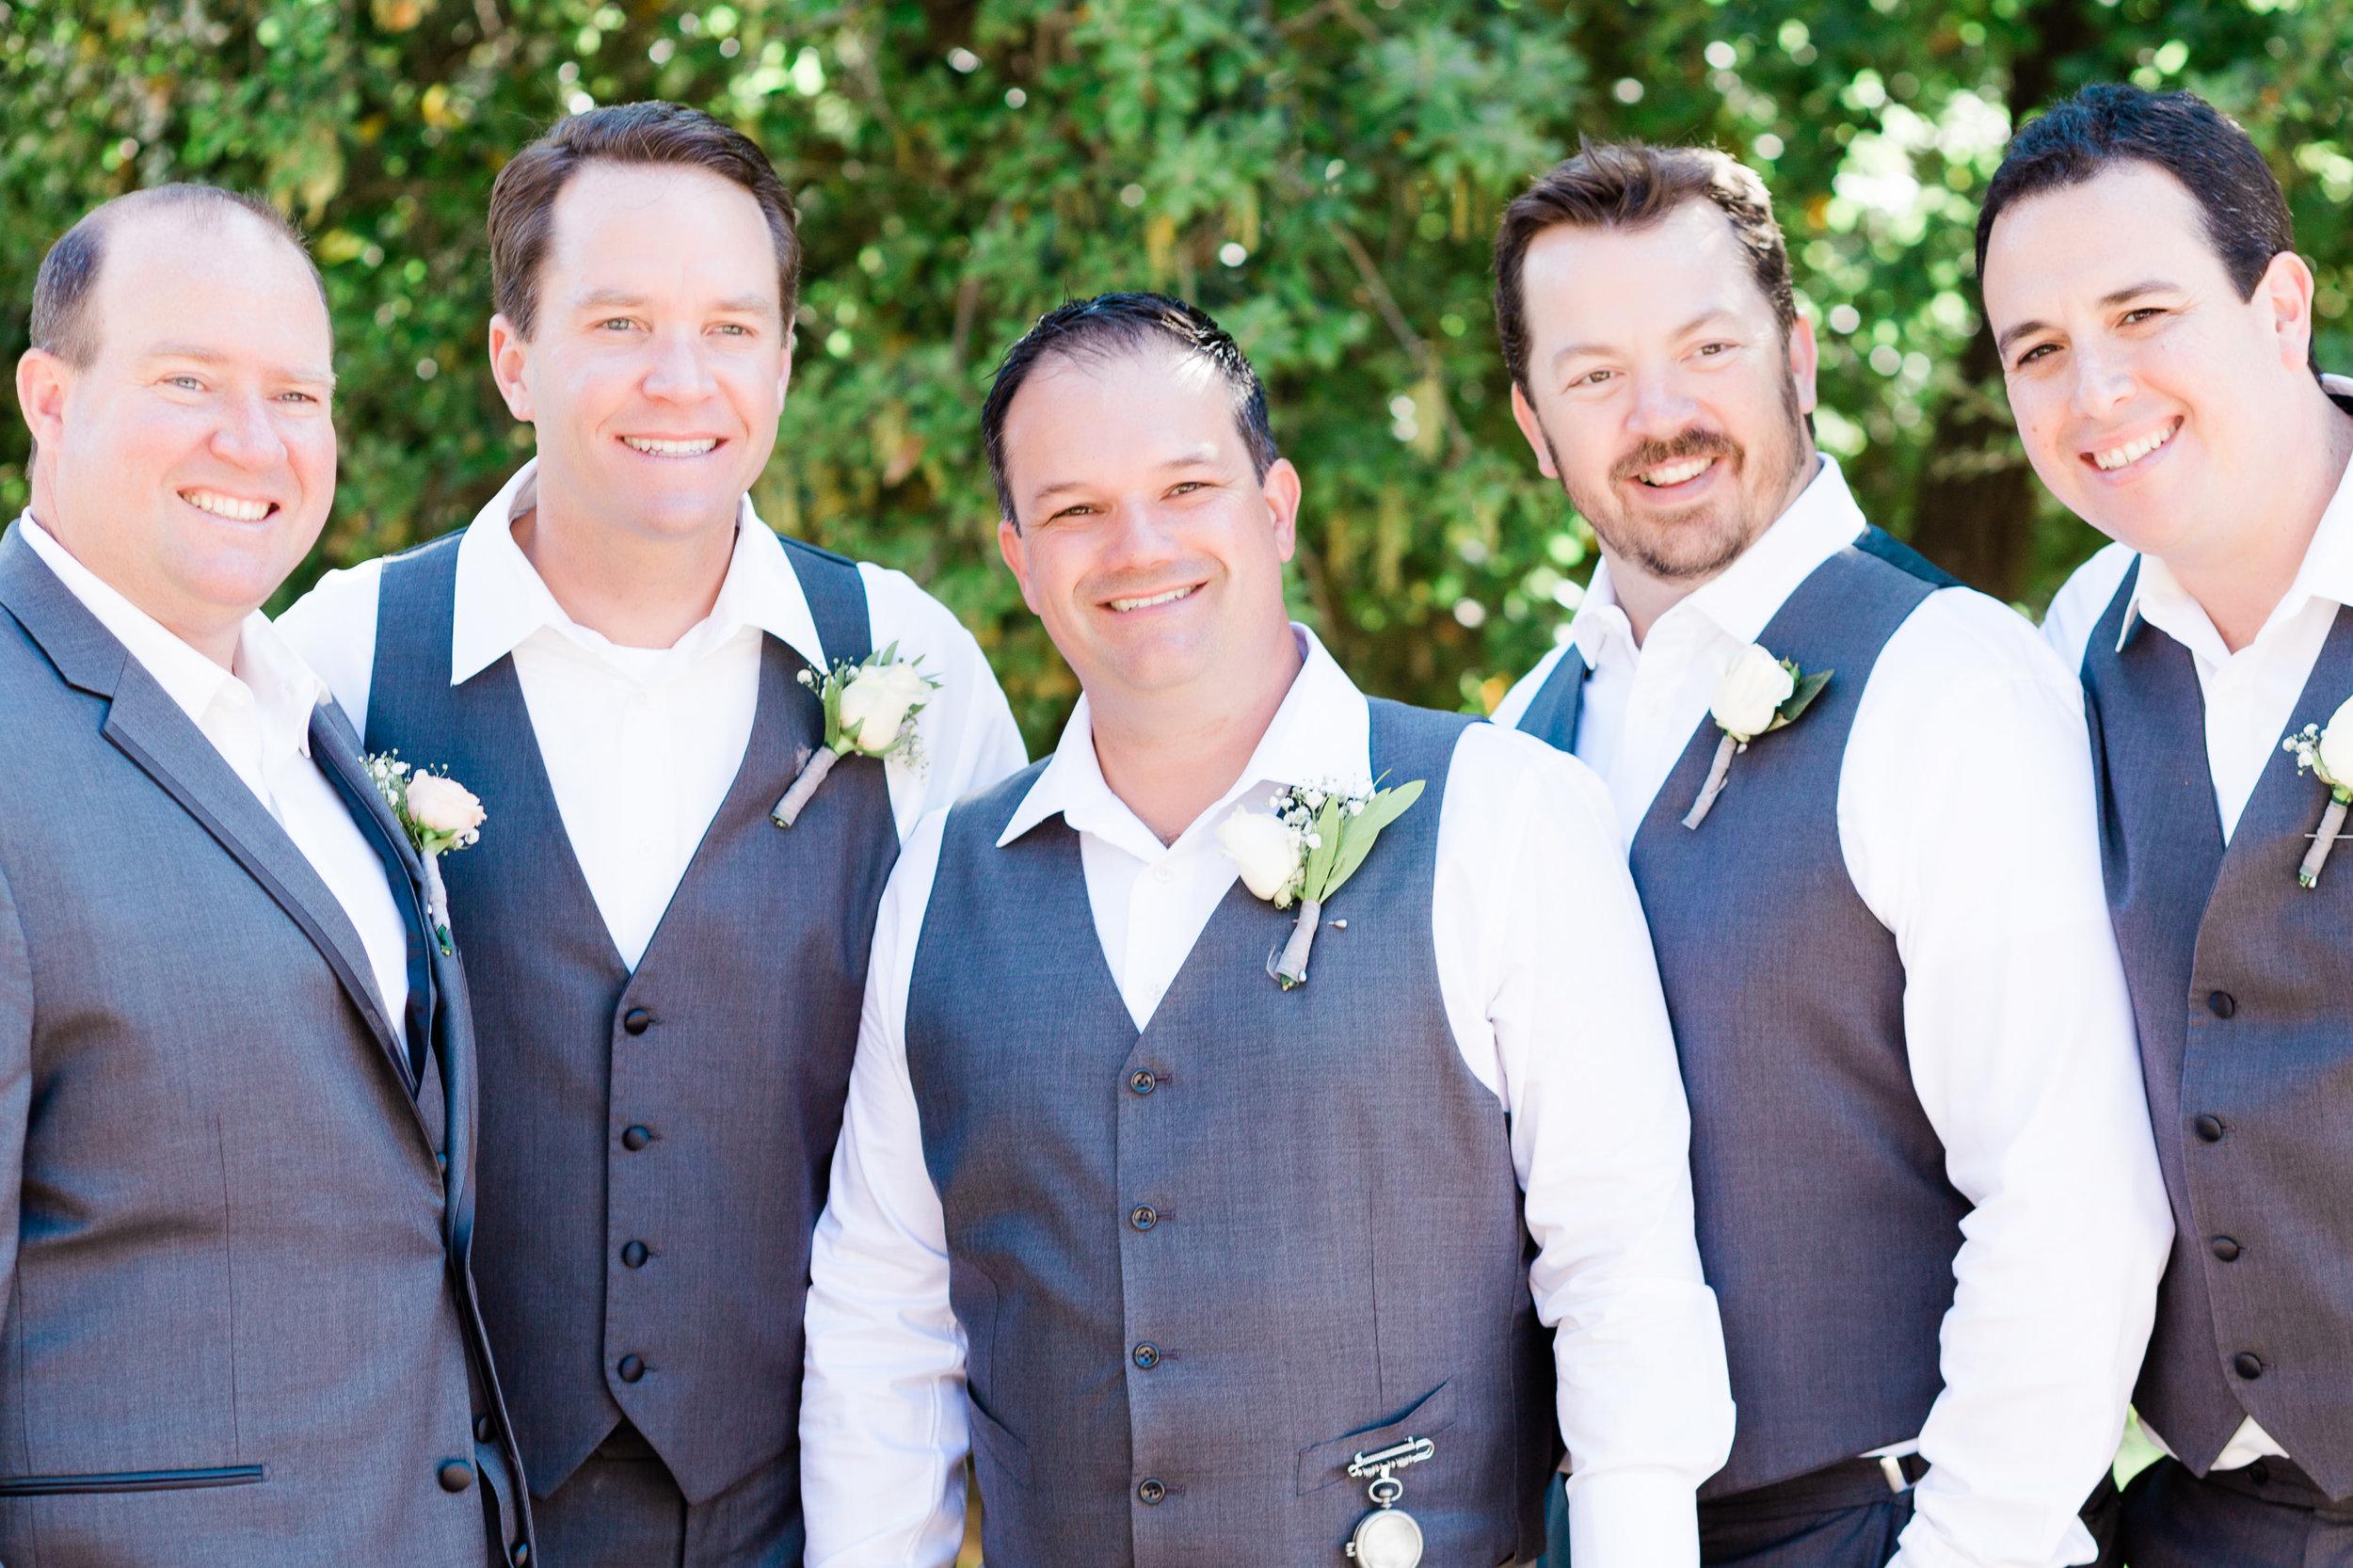 03_24_17_Abby_&_Jeff_Wedding_0450-Edit.jpg